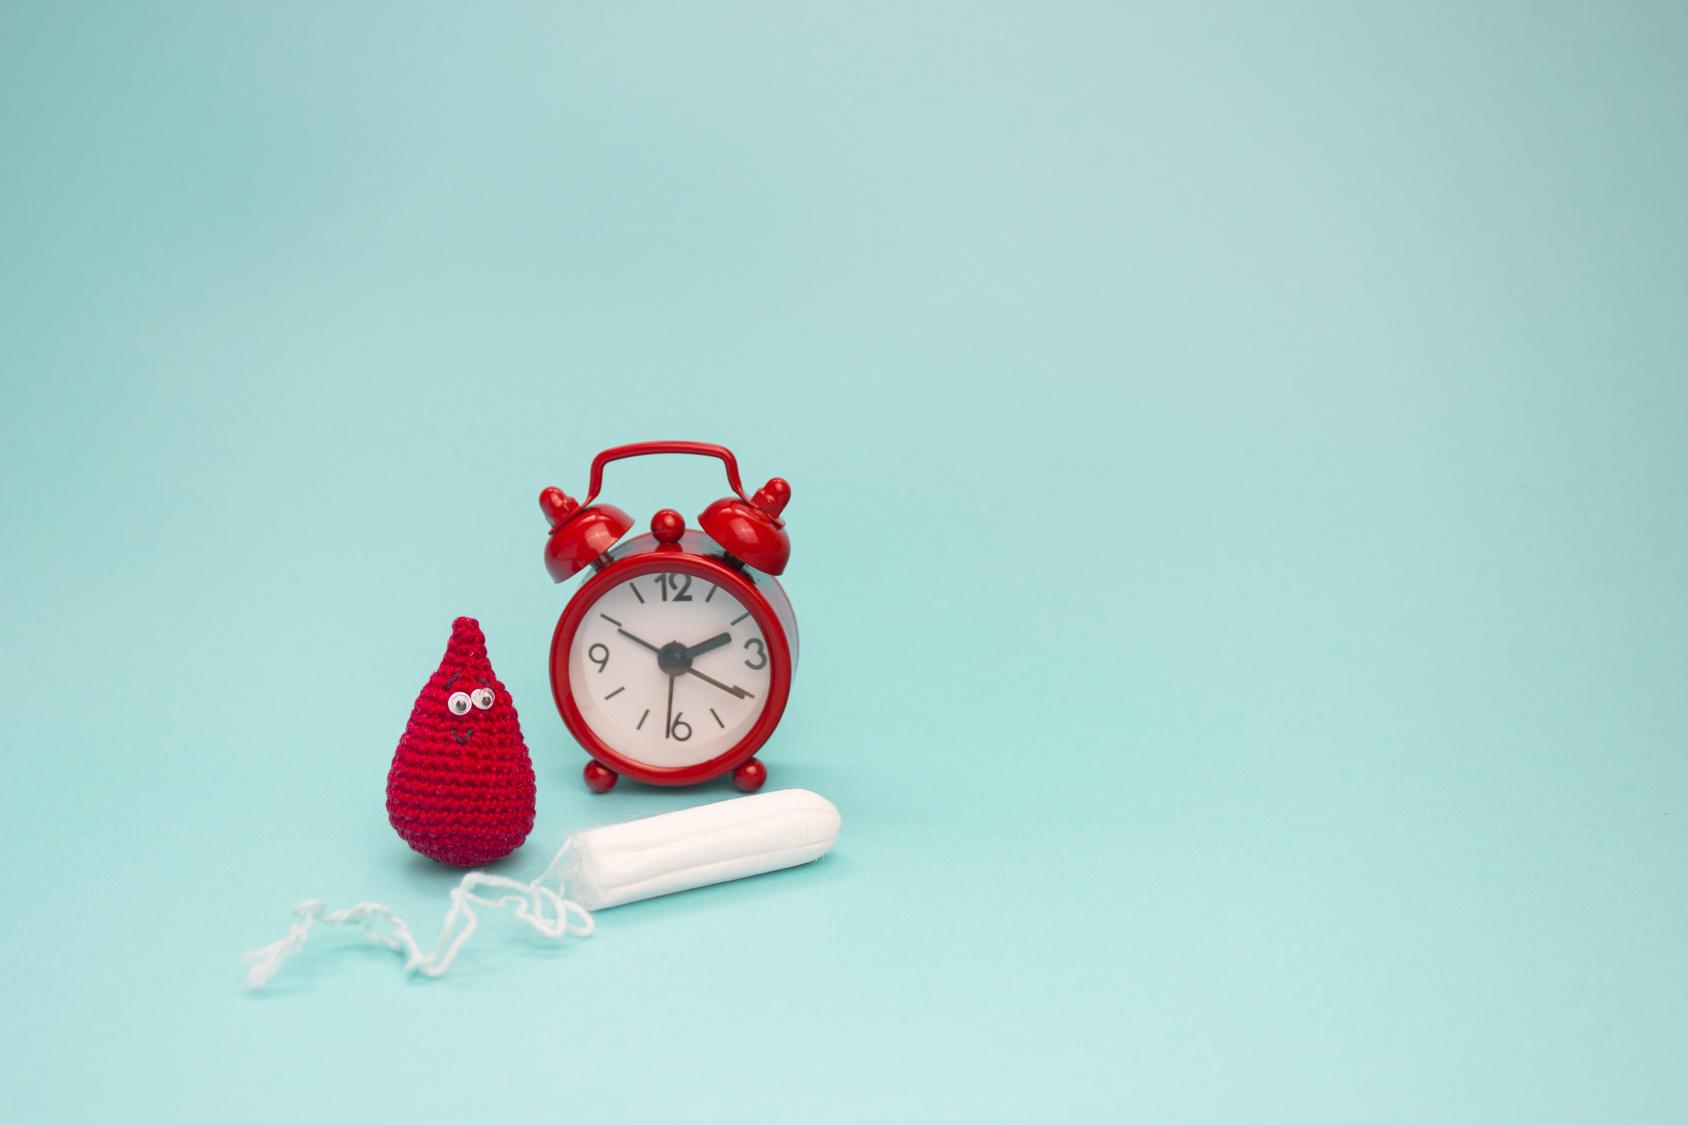 10 tage dauert periode Menstruation: Alles